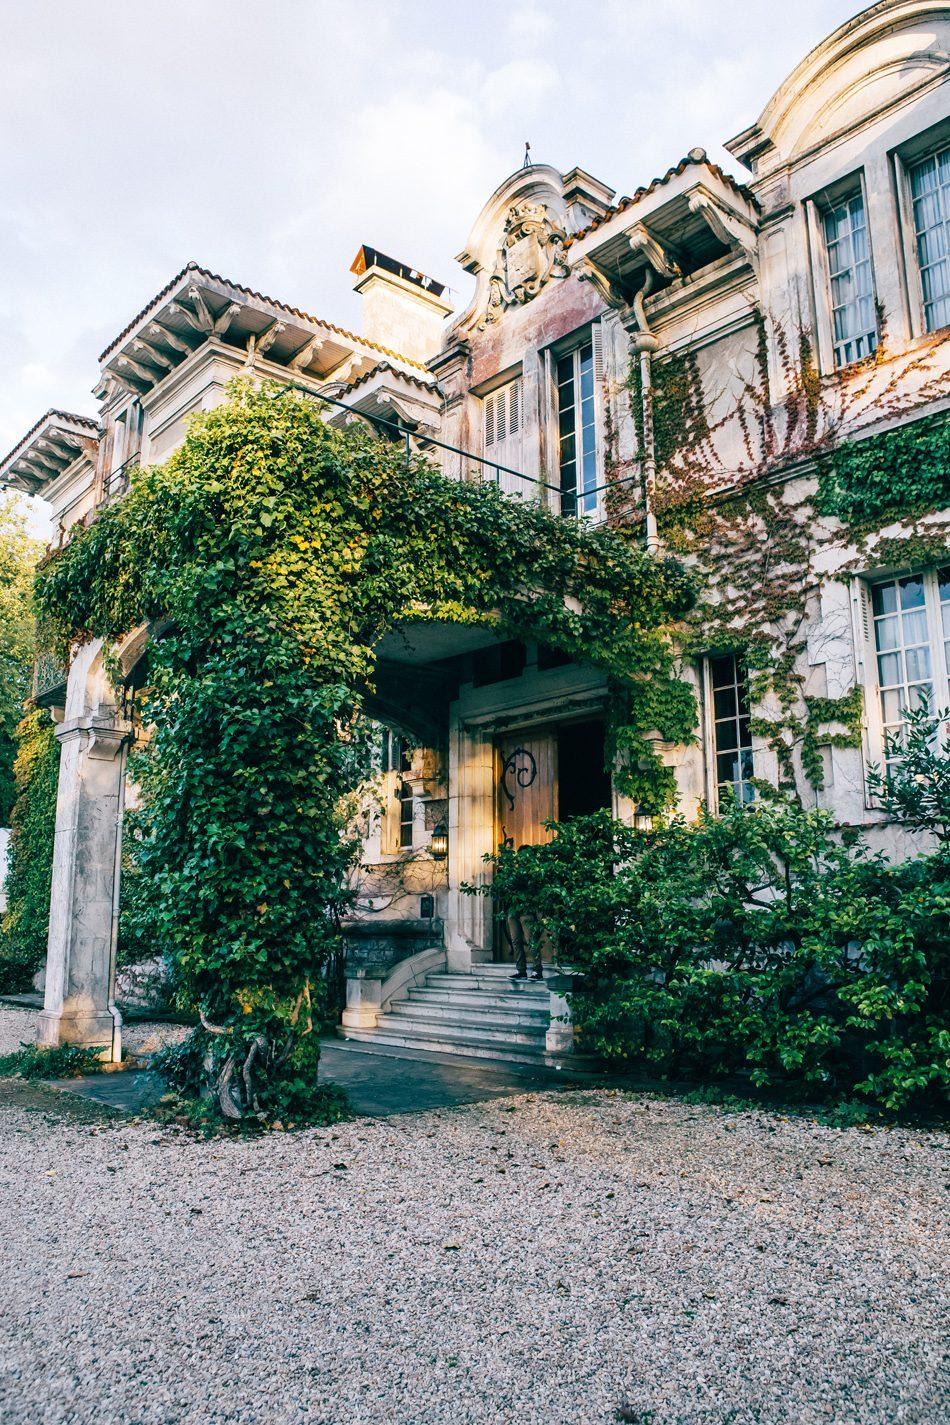 ruban collectif photographe landes france pays basque papeterie mariage fleuriste aquitaine wedding photography chateau d arcangues